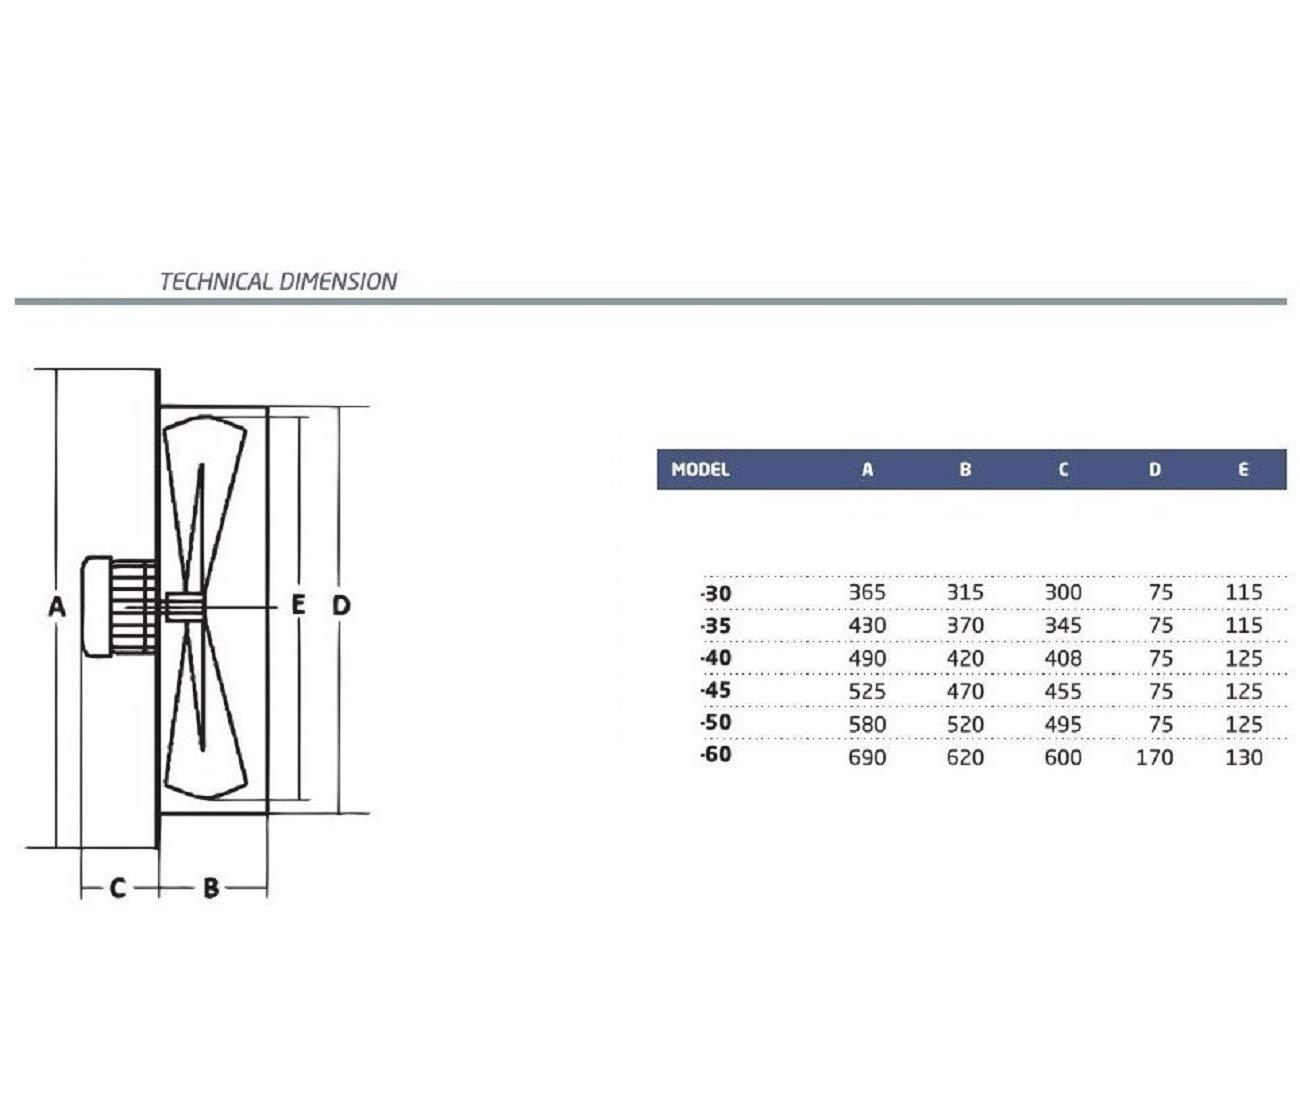 350mm Ventilador industrial Ventilaci/ón Extractor Ventiladores ventiladore industriales Axial axiales extractores aspiracion mura pared ventana extractores Helicoidal Helicoidales Extraccion